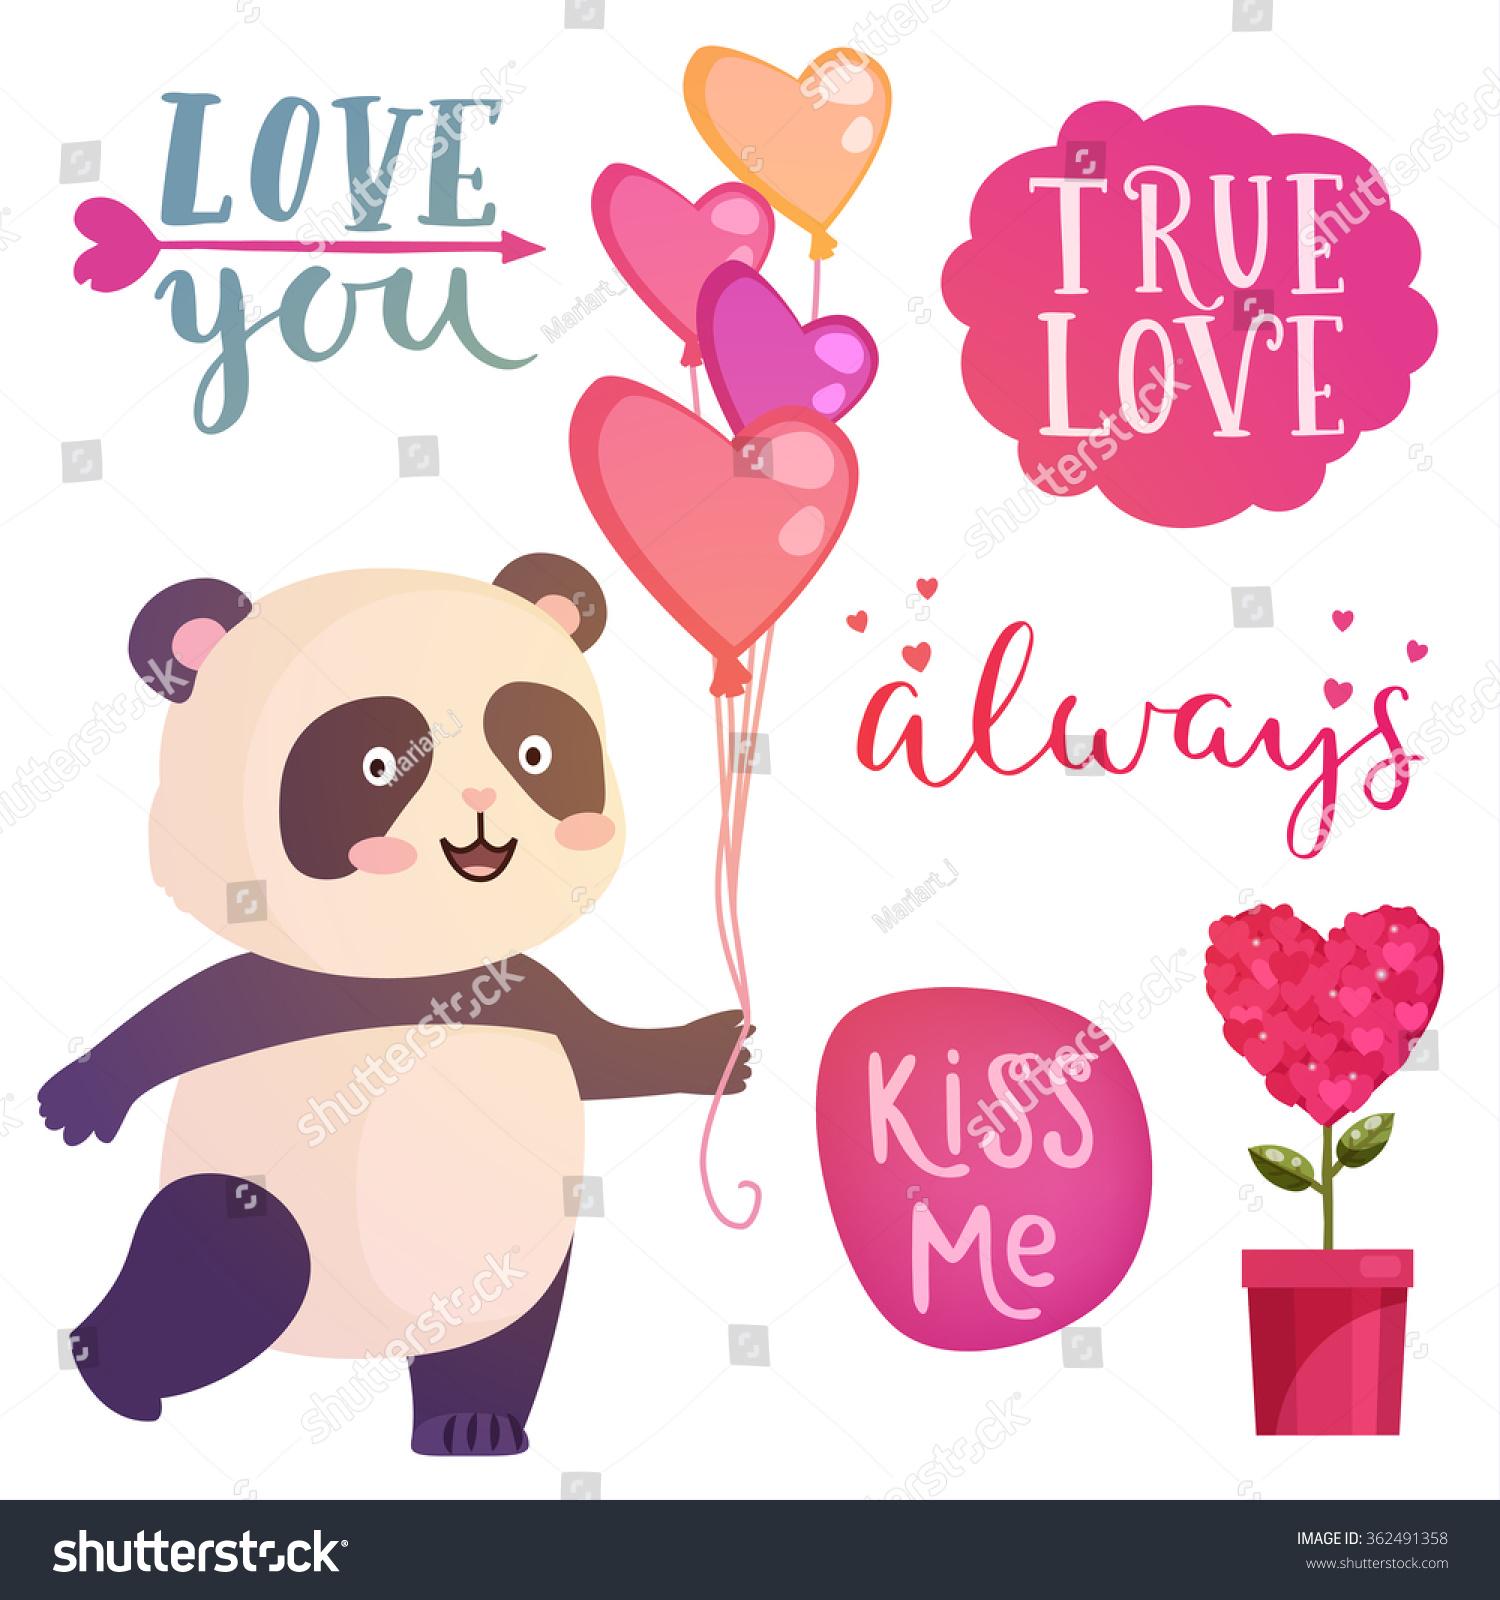 Cute Panda Illustration Lettering Quotes Design Stock